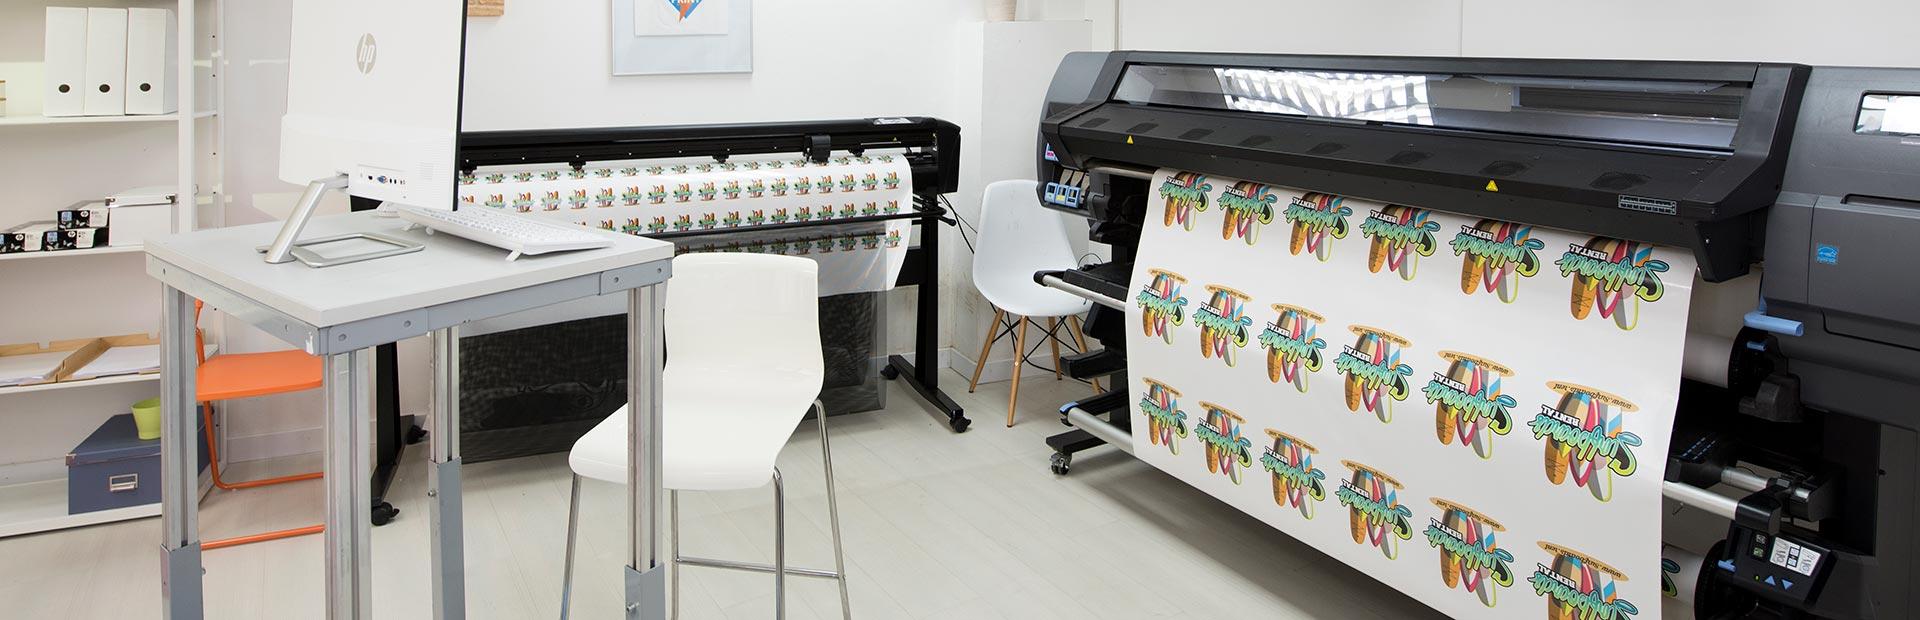 xbanner-print-and-cut